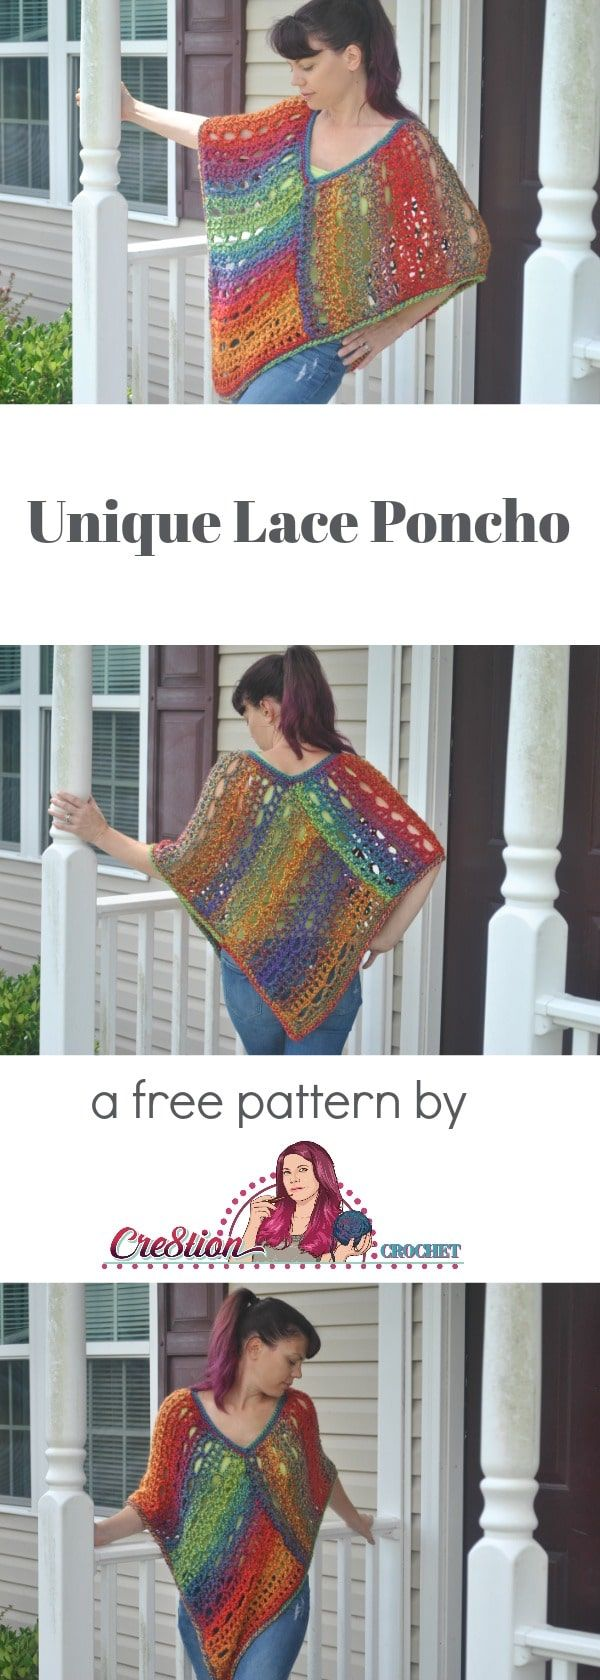 Unique Lace Poncho - Cre8tion Crochet | Cute Crochet Corner ...